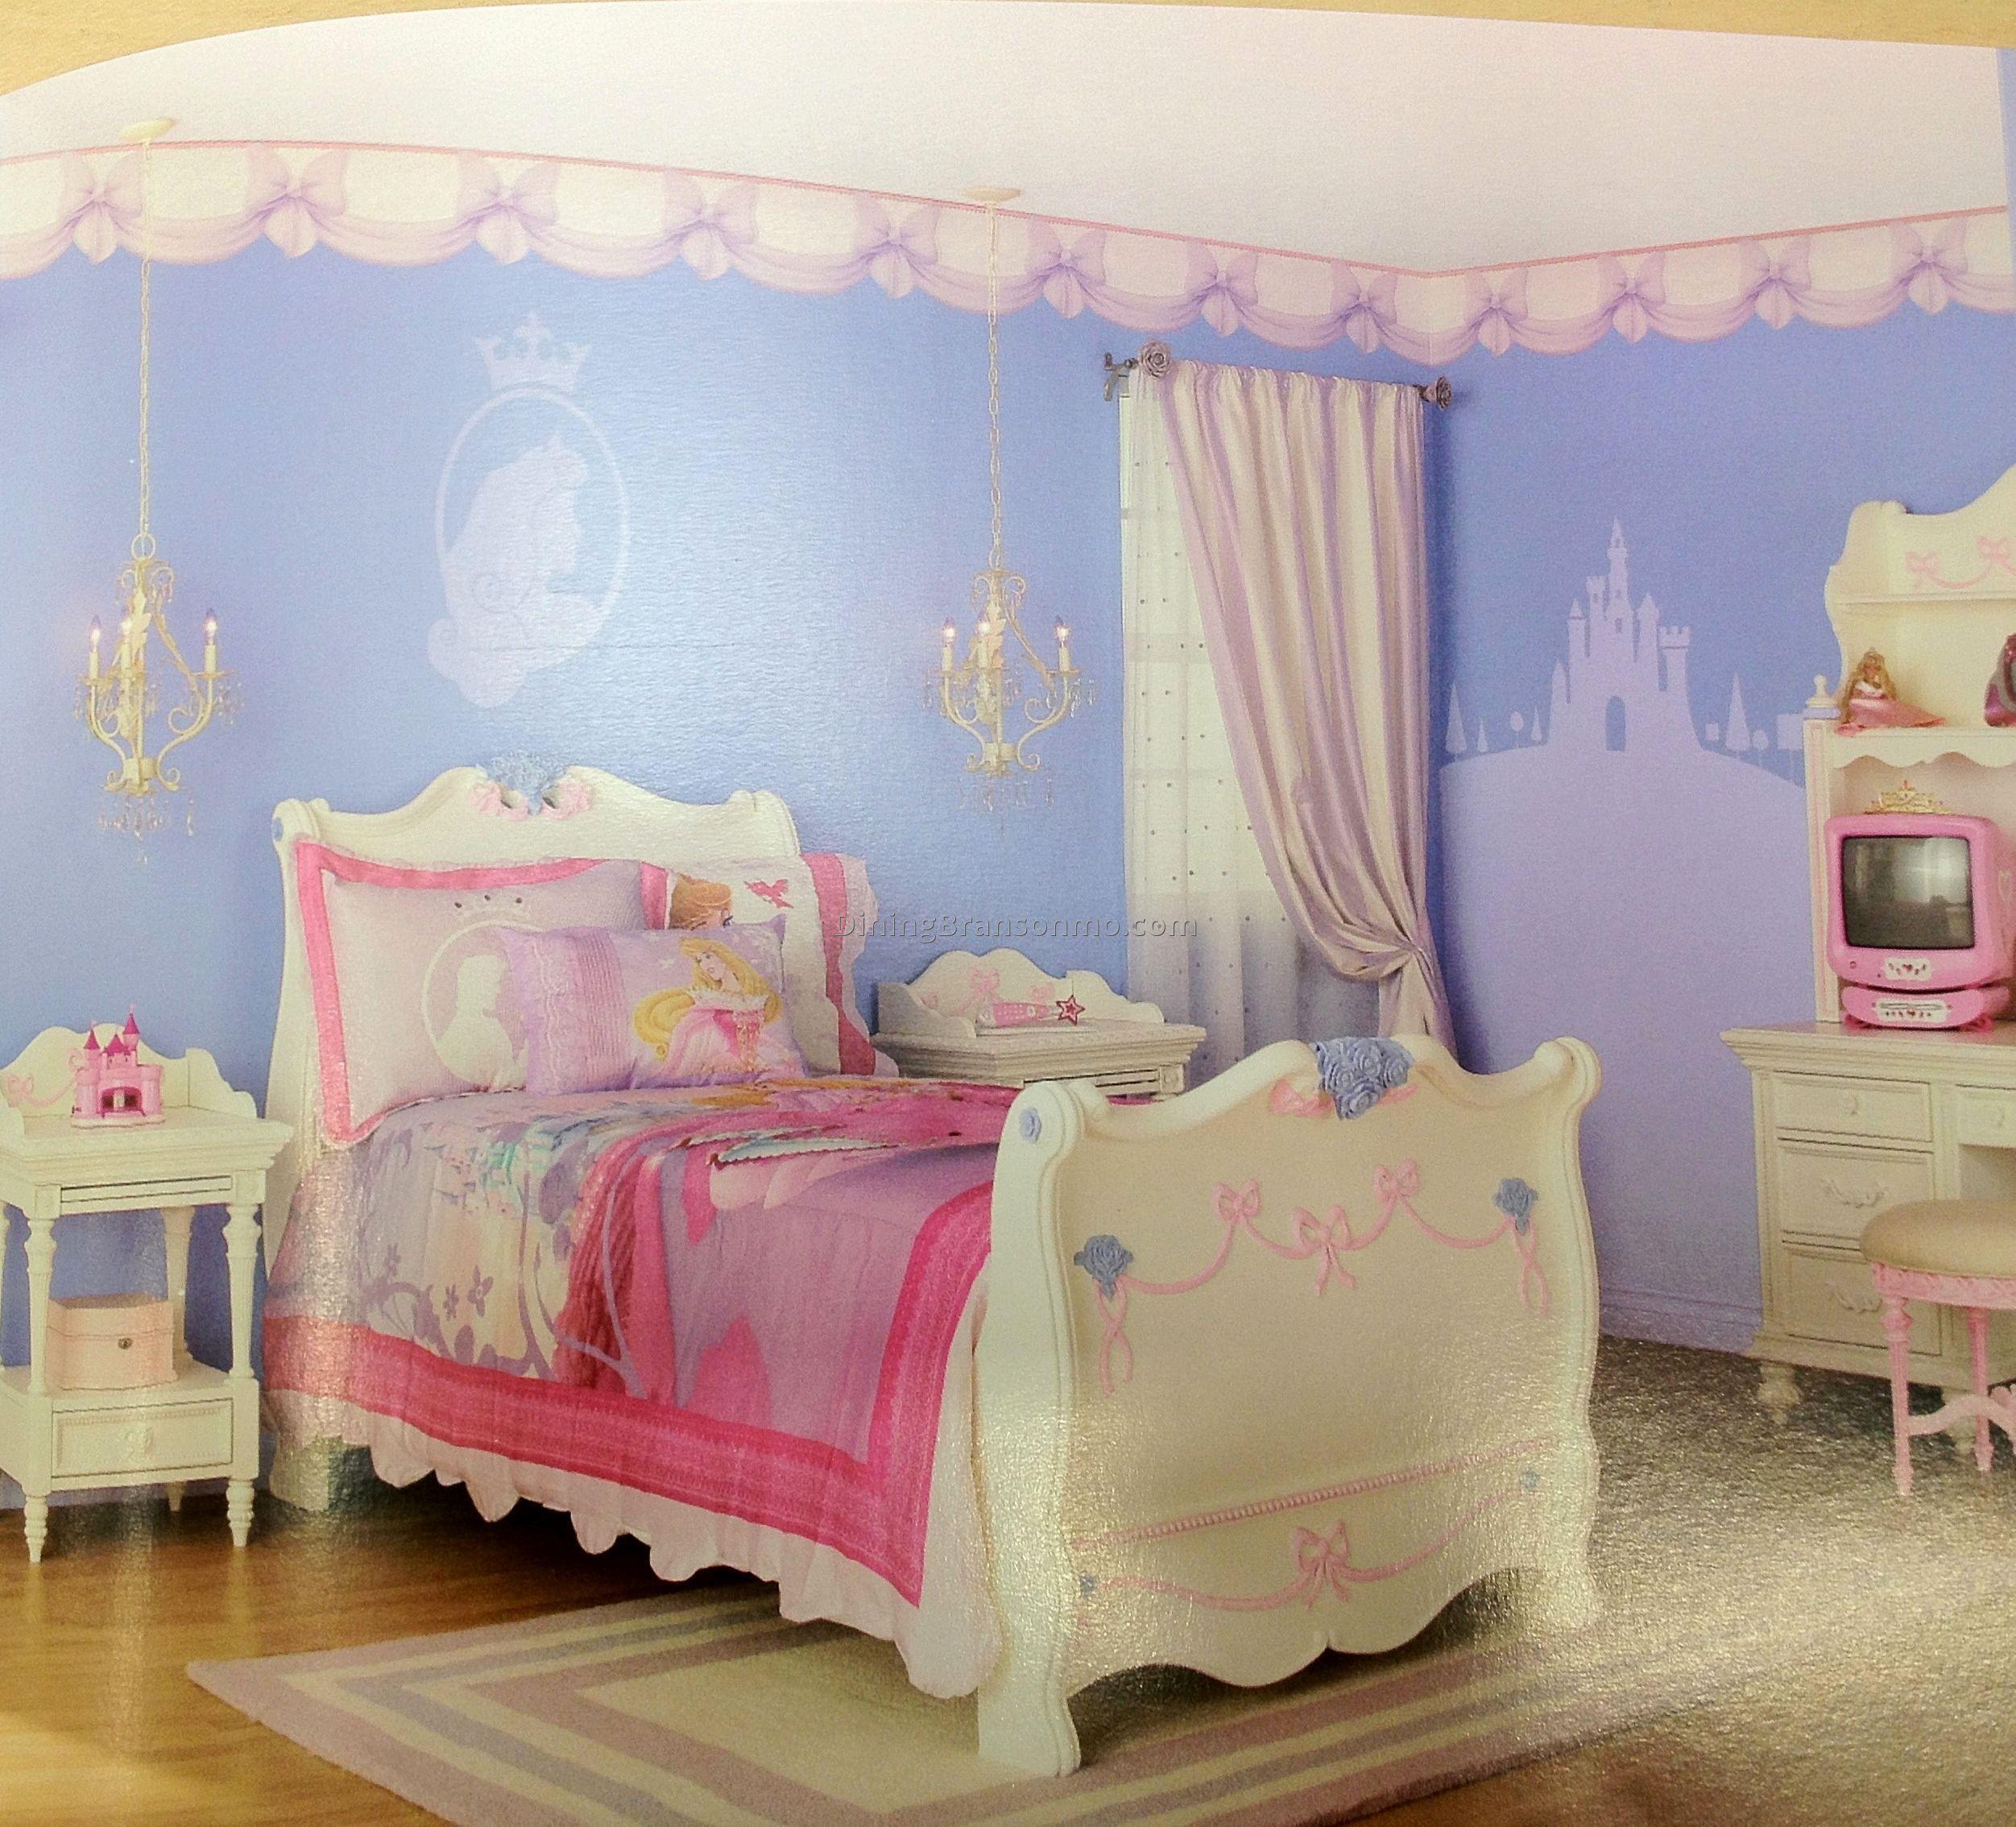 disney princess bedroom wallpaper